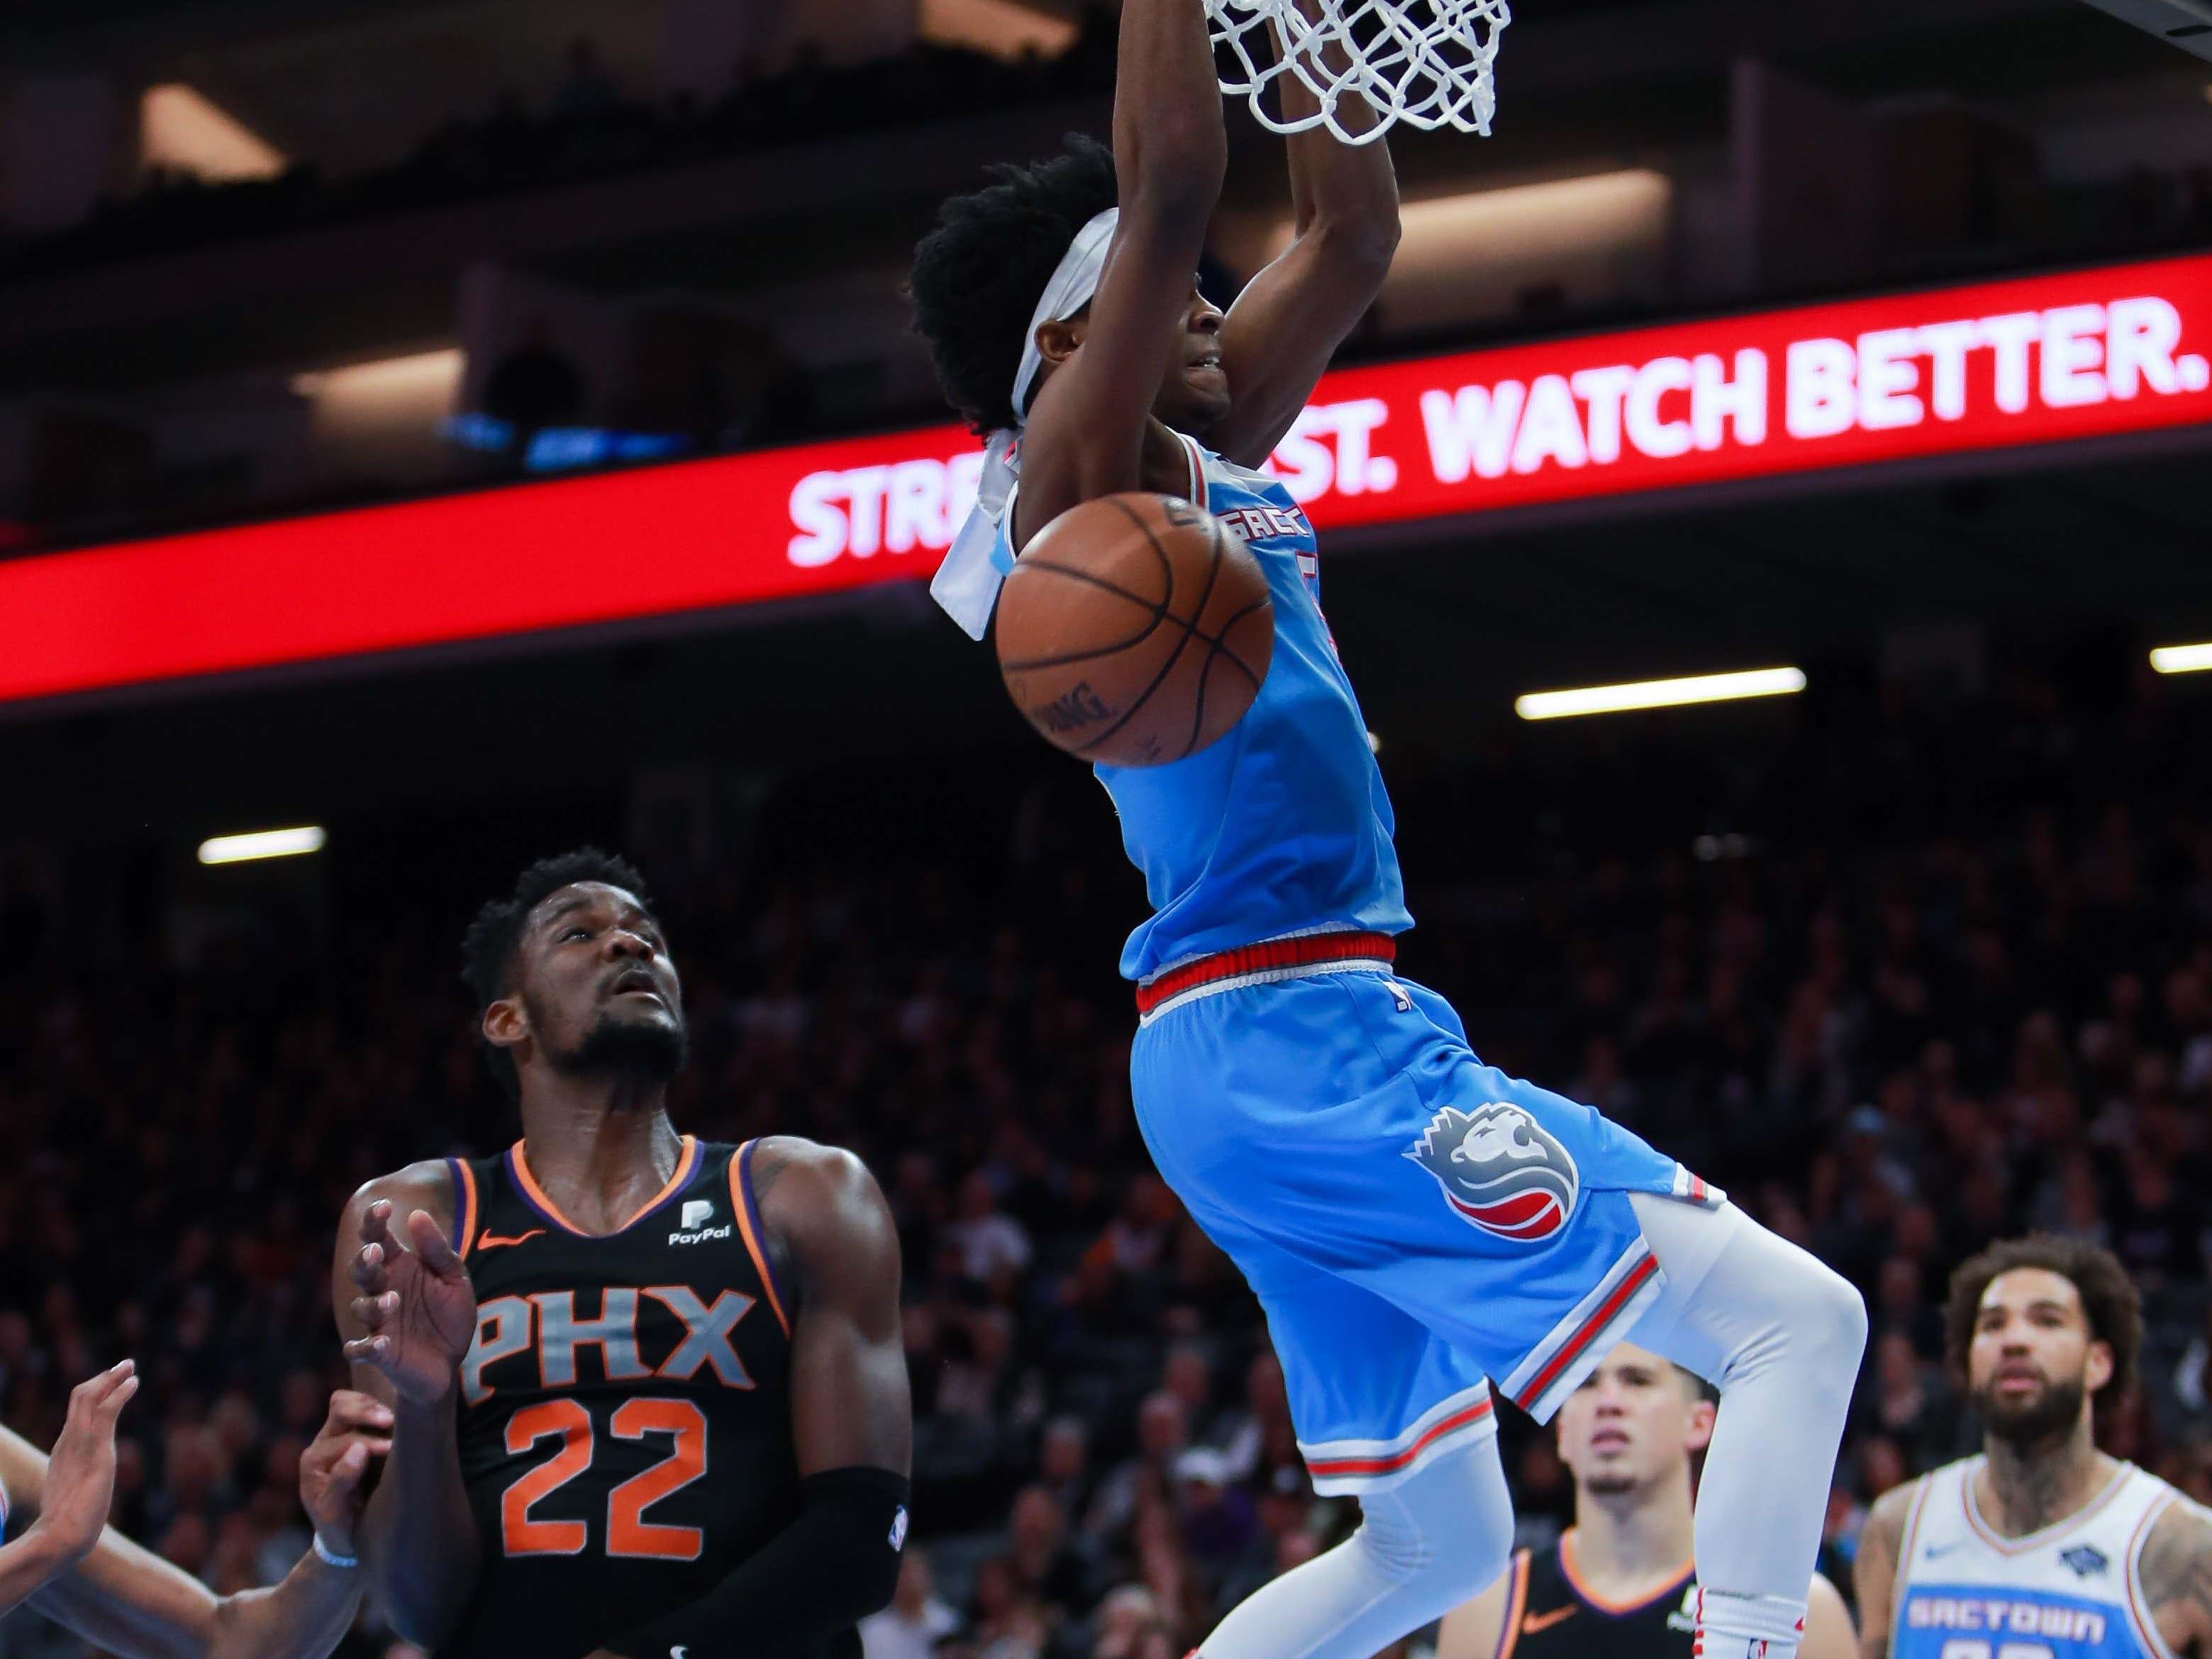 Feb 10, 2019; Sacramento, CA, USA; Sacramento Kings guard De'Aaron Fox (5) dunks the ball against Phoenix Suns center Deandre Ayton (22) during the fourth quarter at Golden 1 Center.